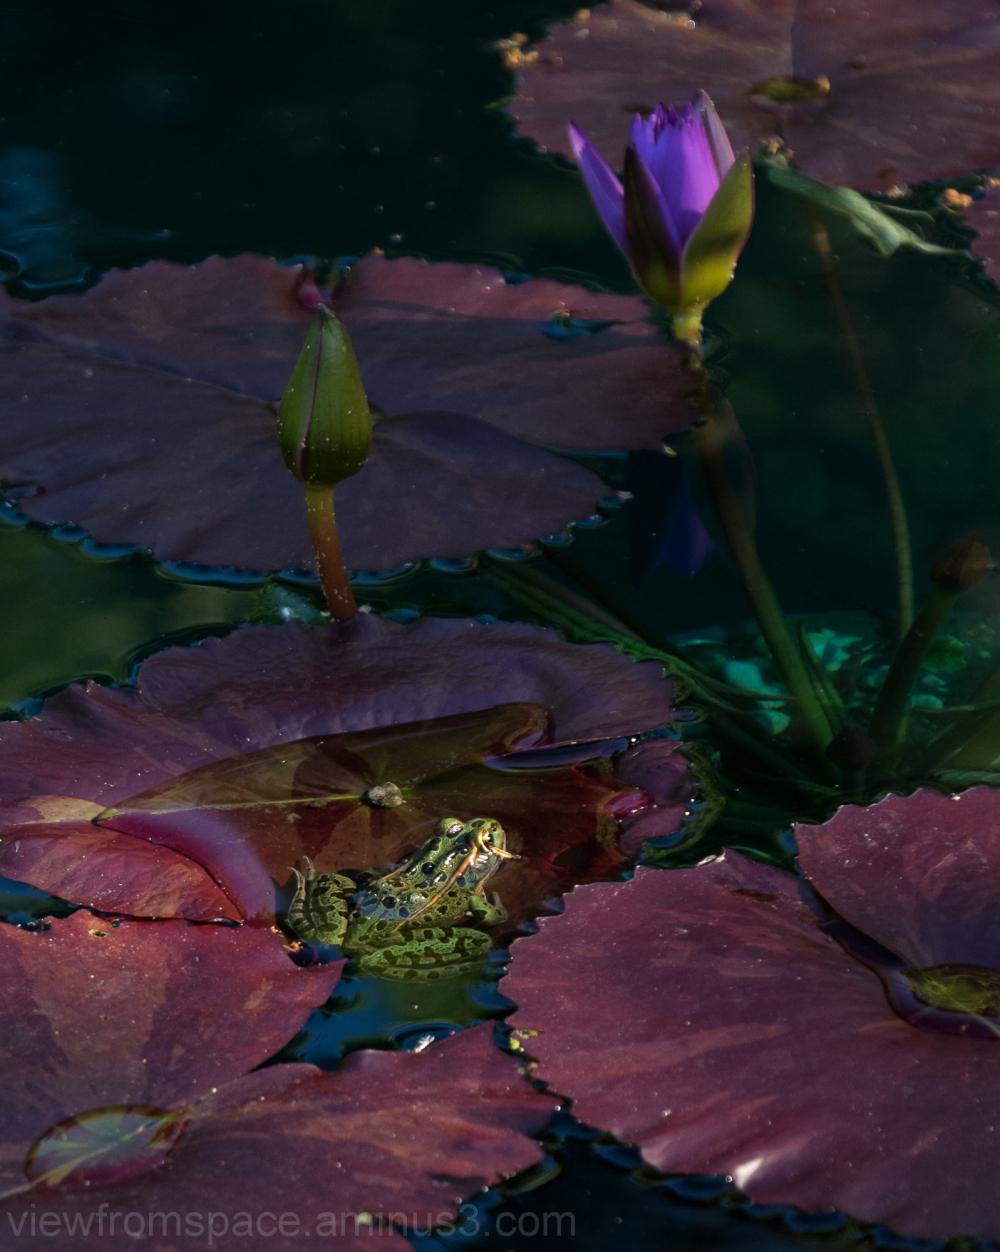 frog lilypad pond winnipeg manitoba canada